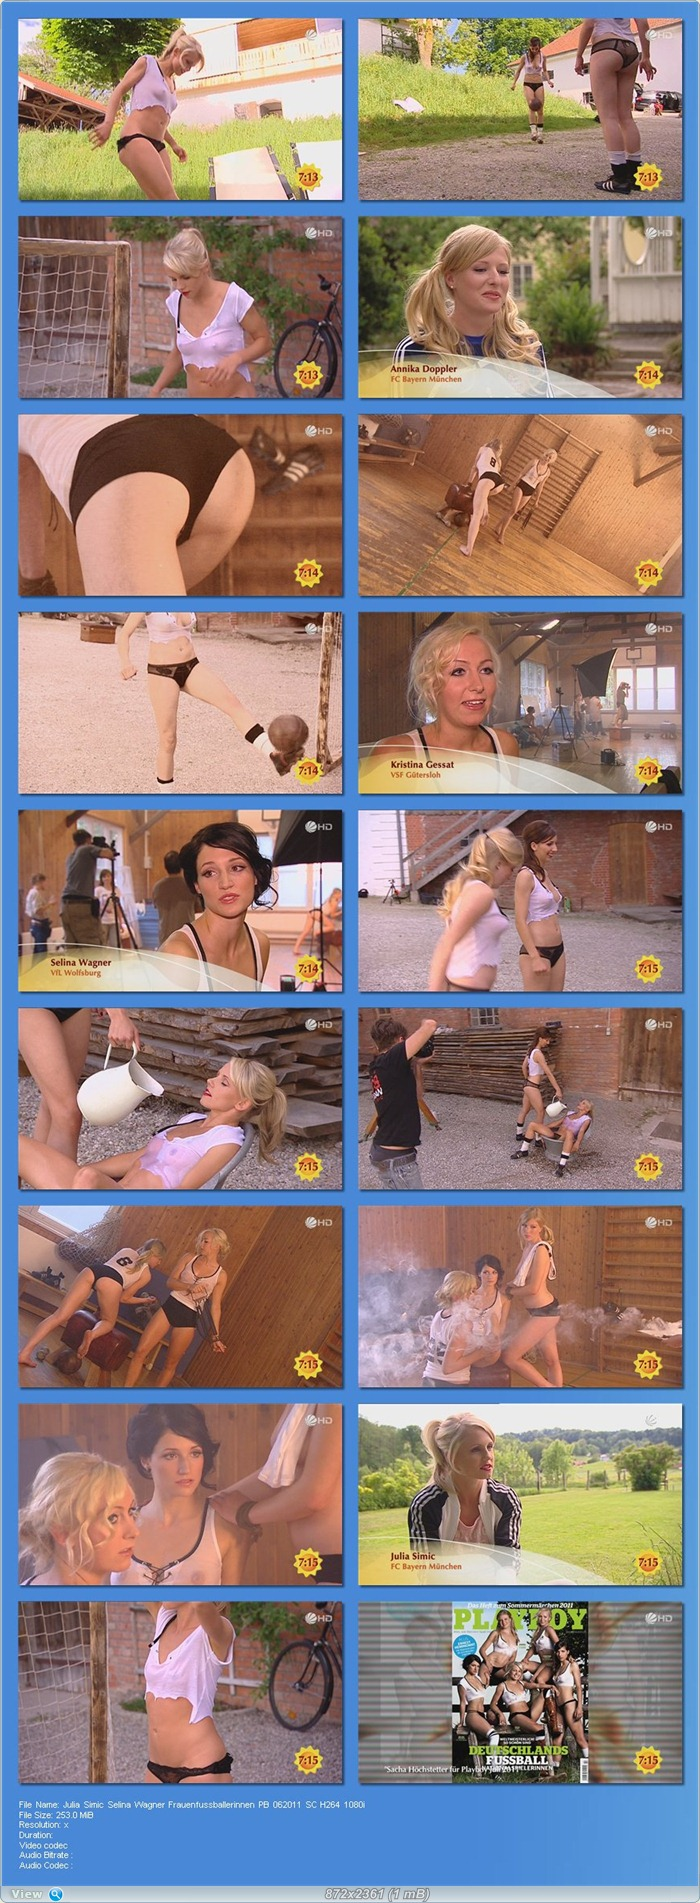 http://i2.imageban.ru/out/2011/07/09/425ec8d46e588be4d21f0d22c043aa56.jpg